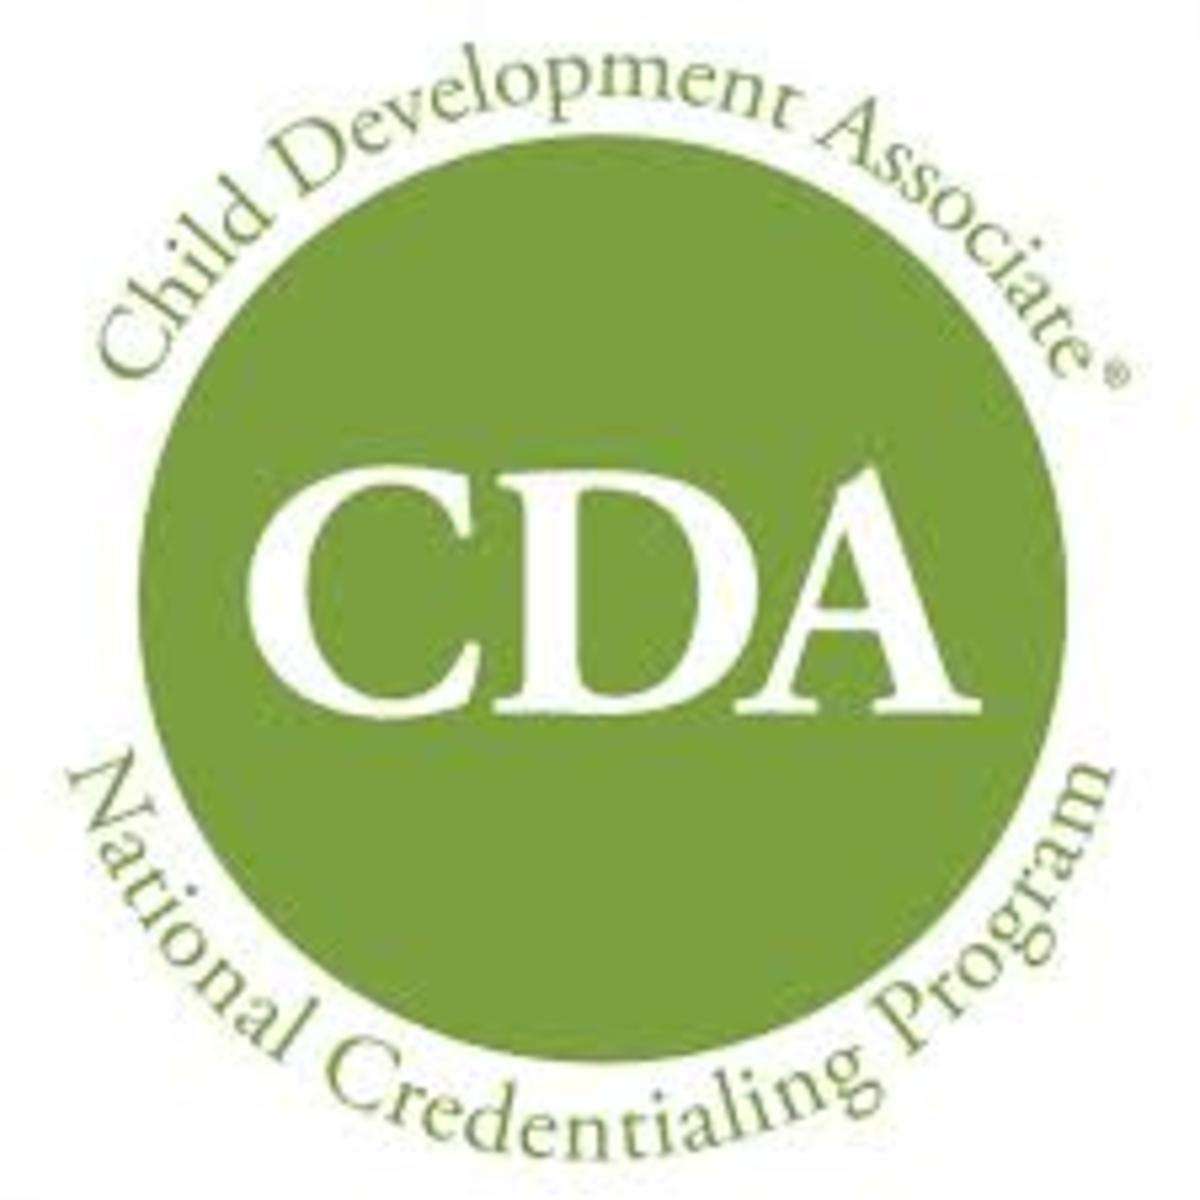 CDA Competency Statement I